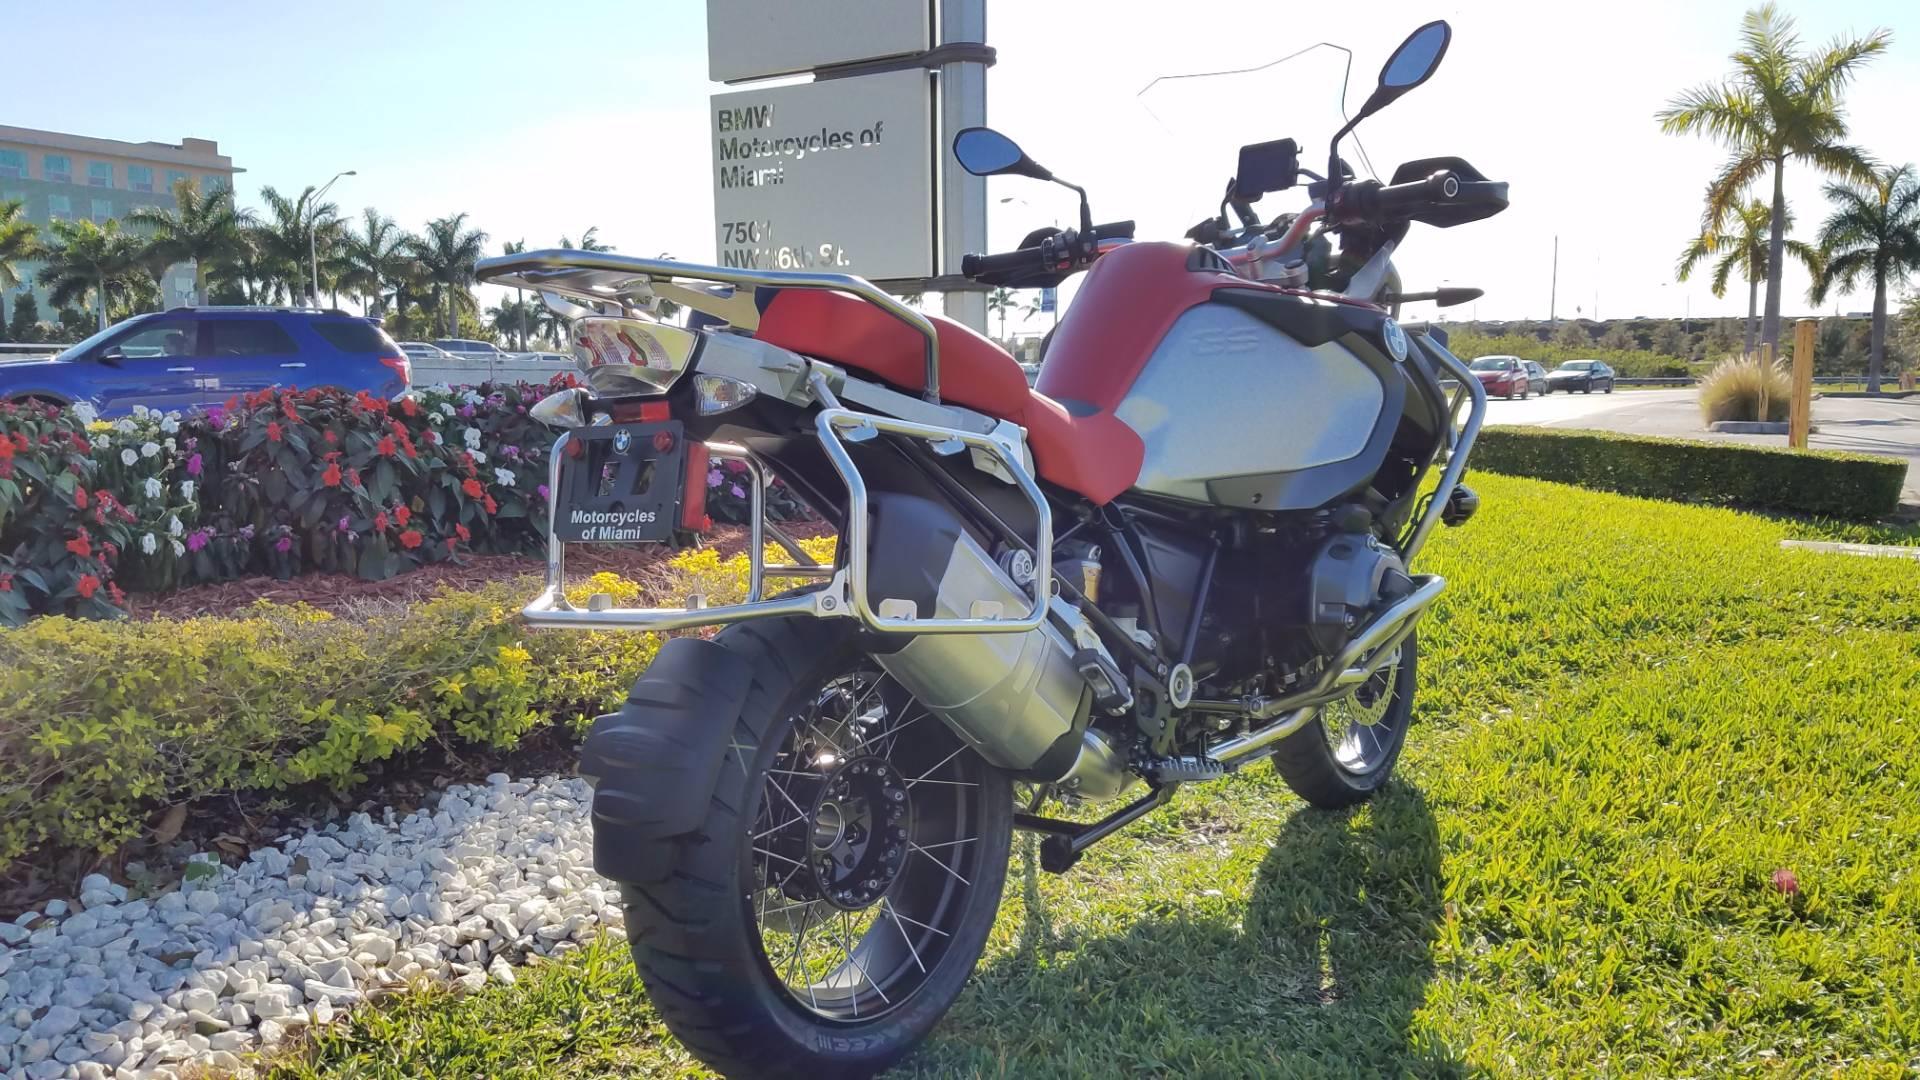 New 2017 BMW R 1200 GSA For Sale, BMW R 1200 GSA For Sale, BMW Motorcycle ADVENTURE, new BMW Motorcycle